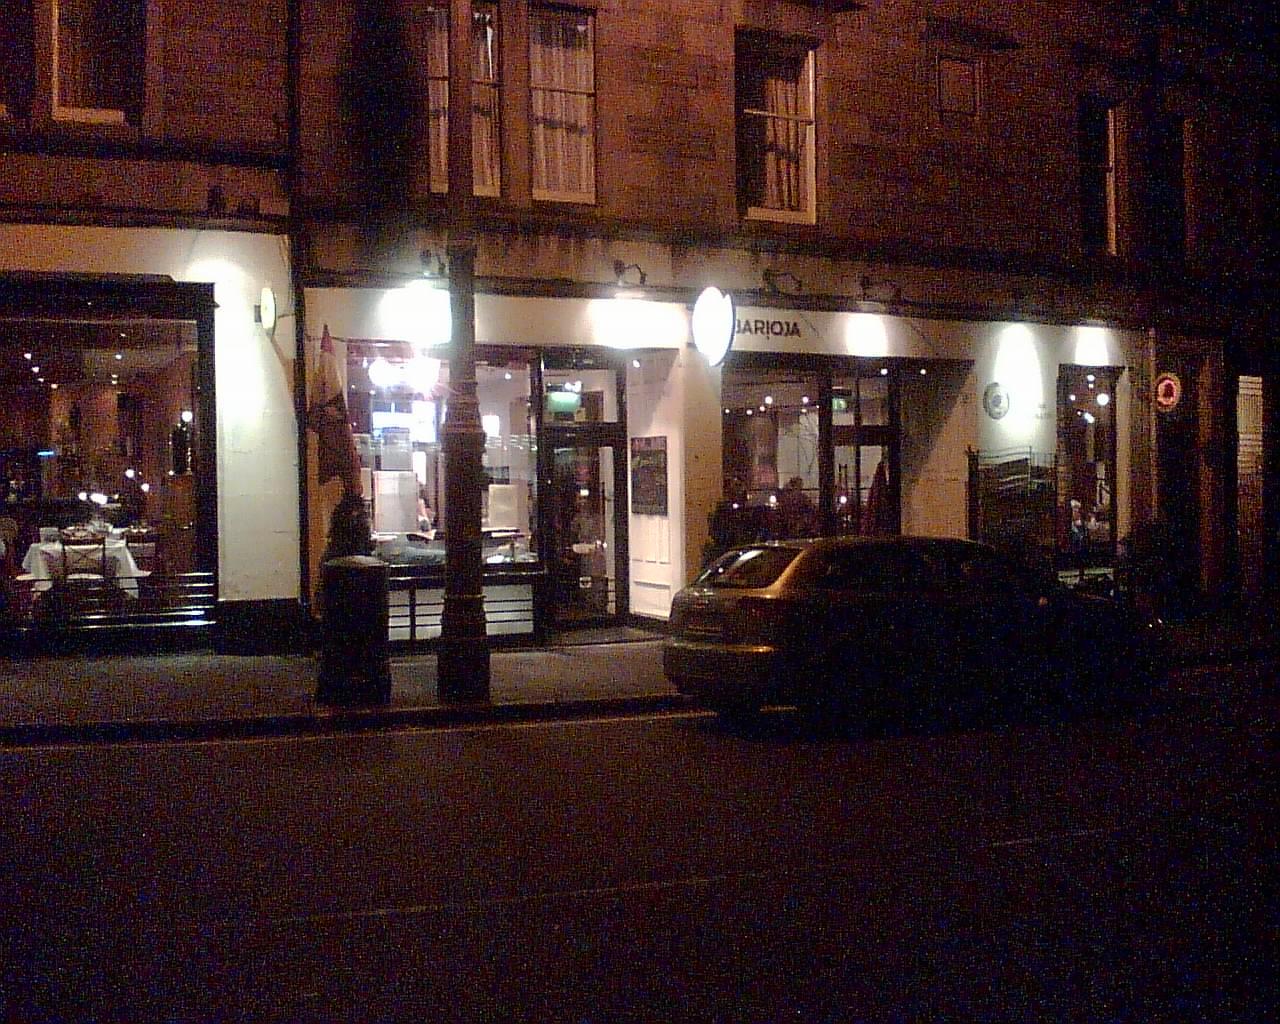 Barioja, Edinburgh